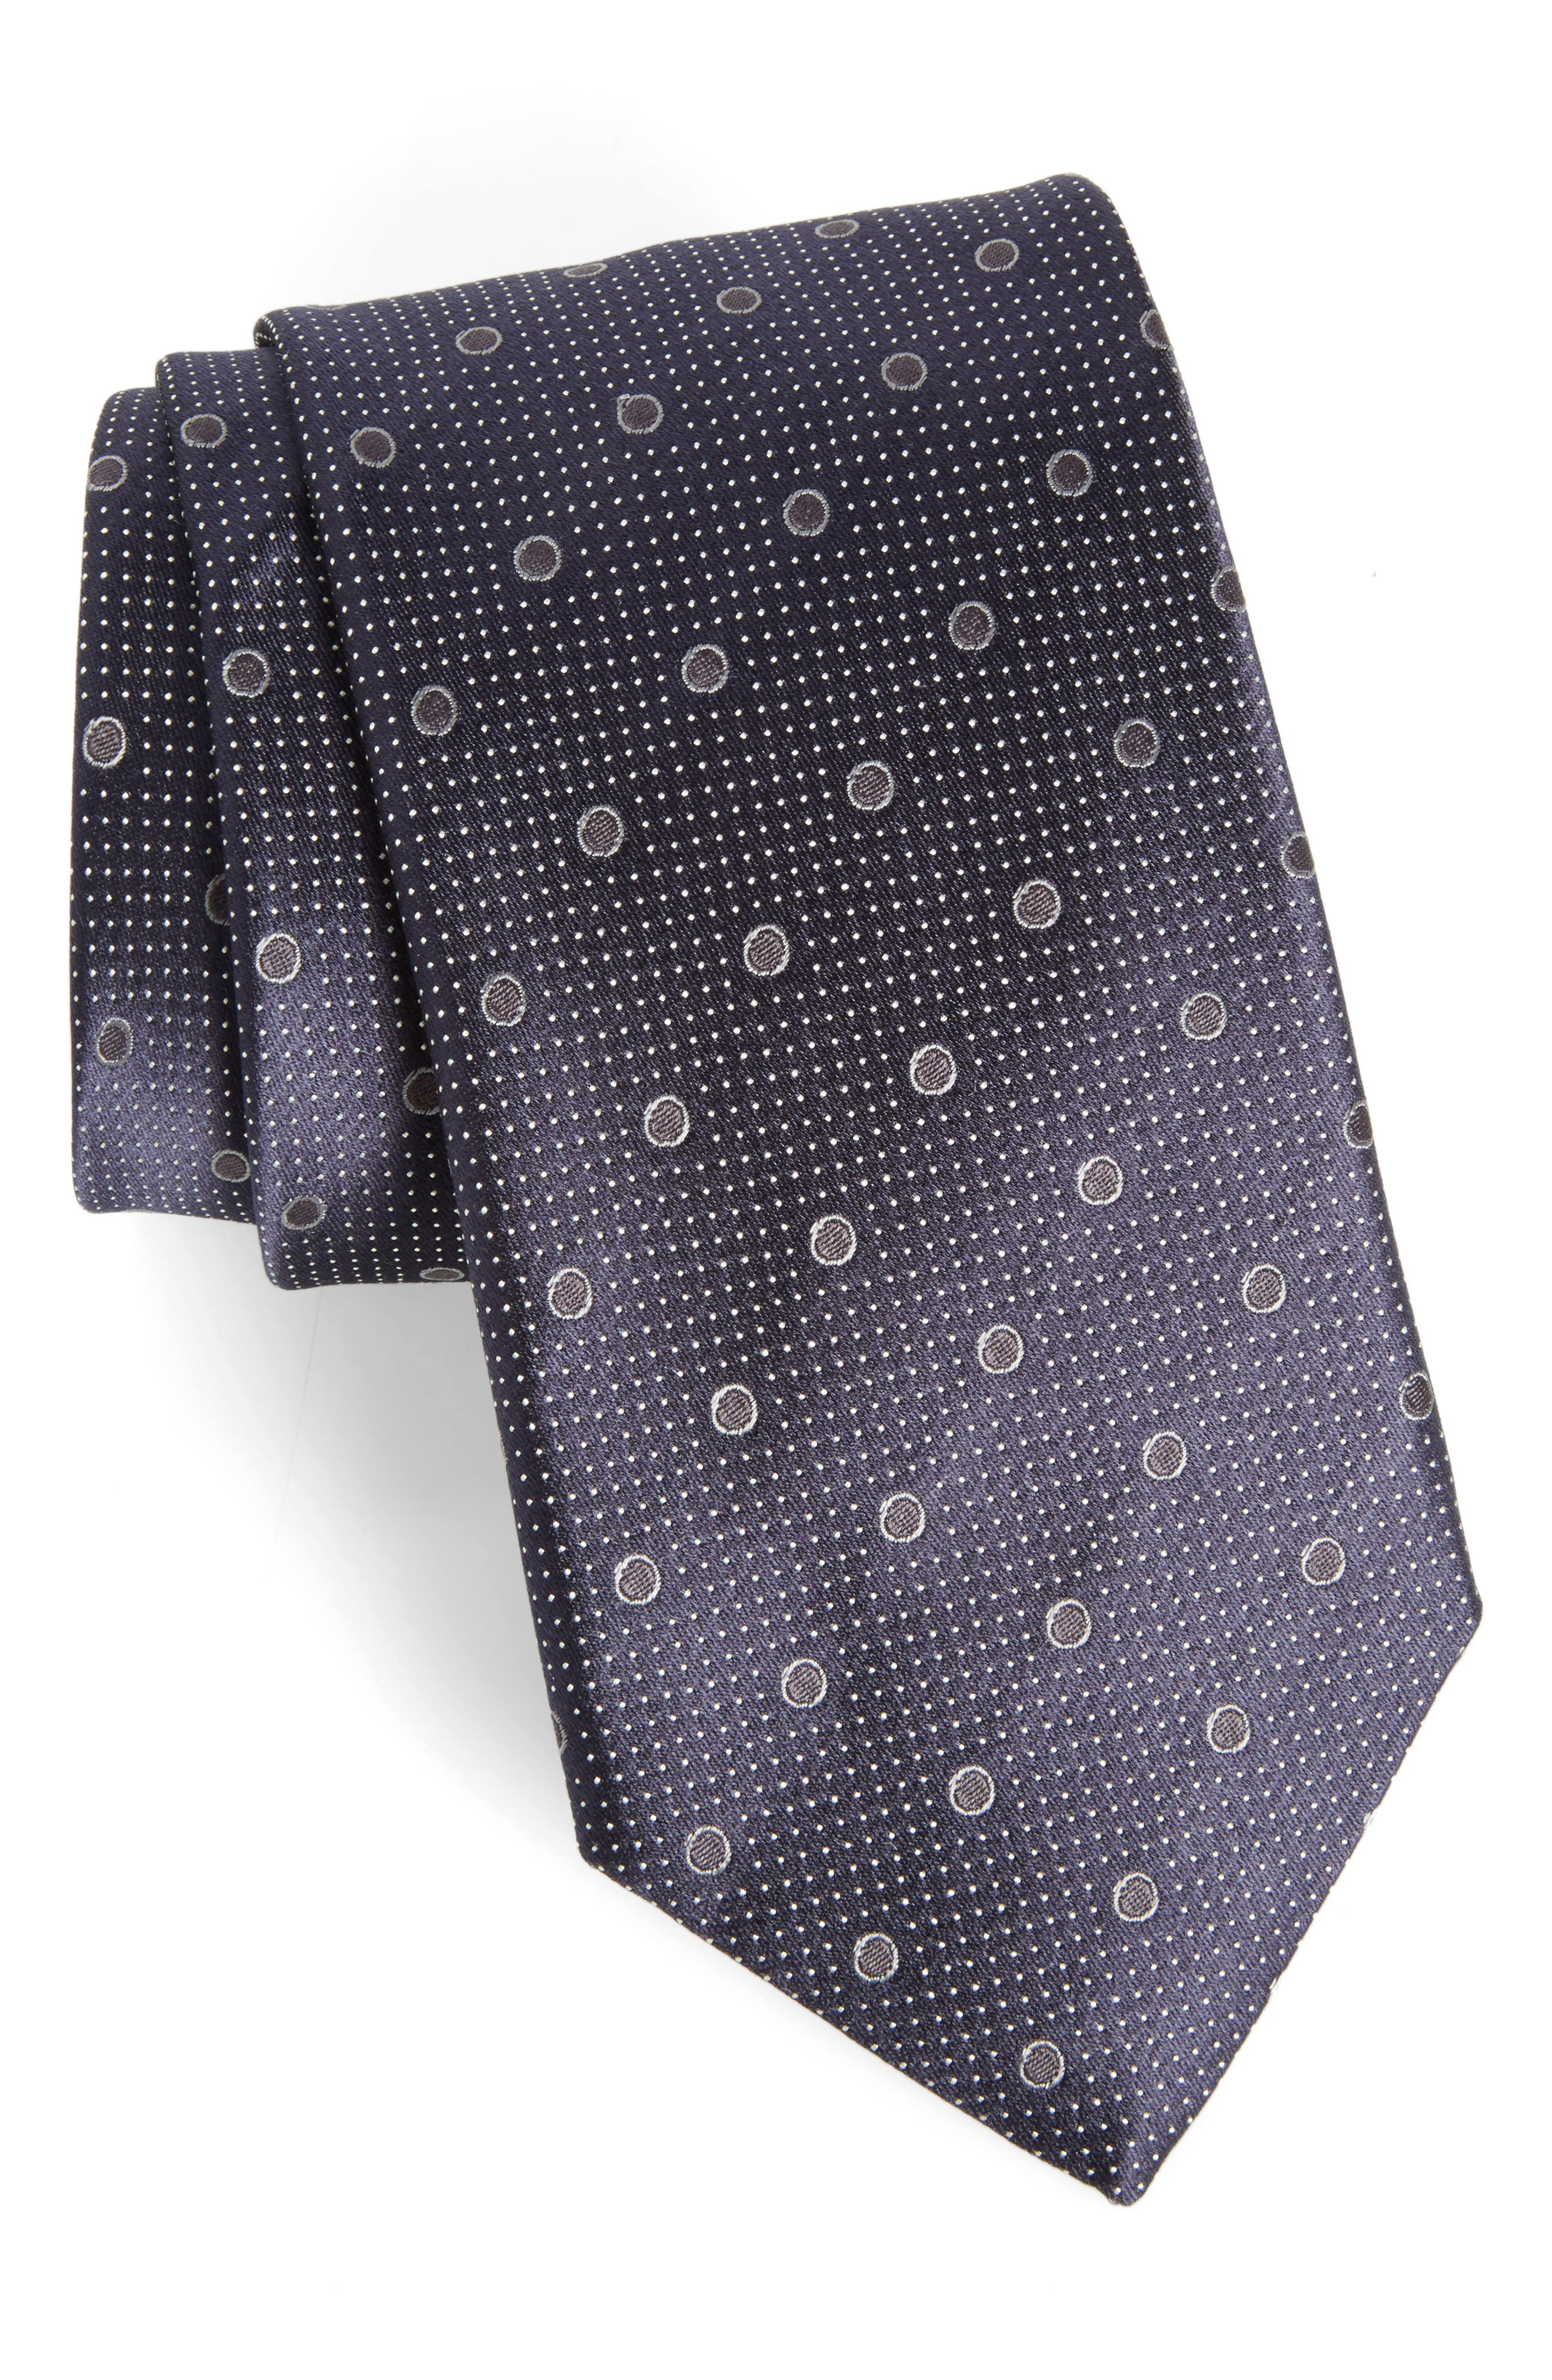 Main Image - Canali Dot Silk Tie